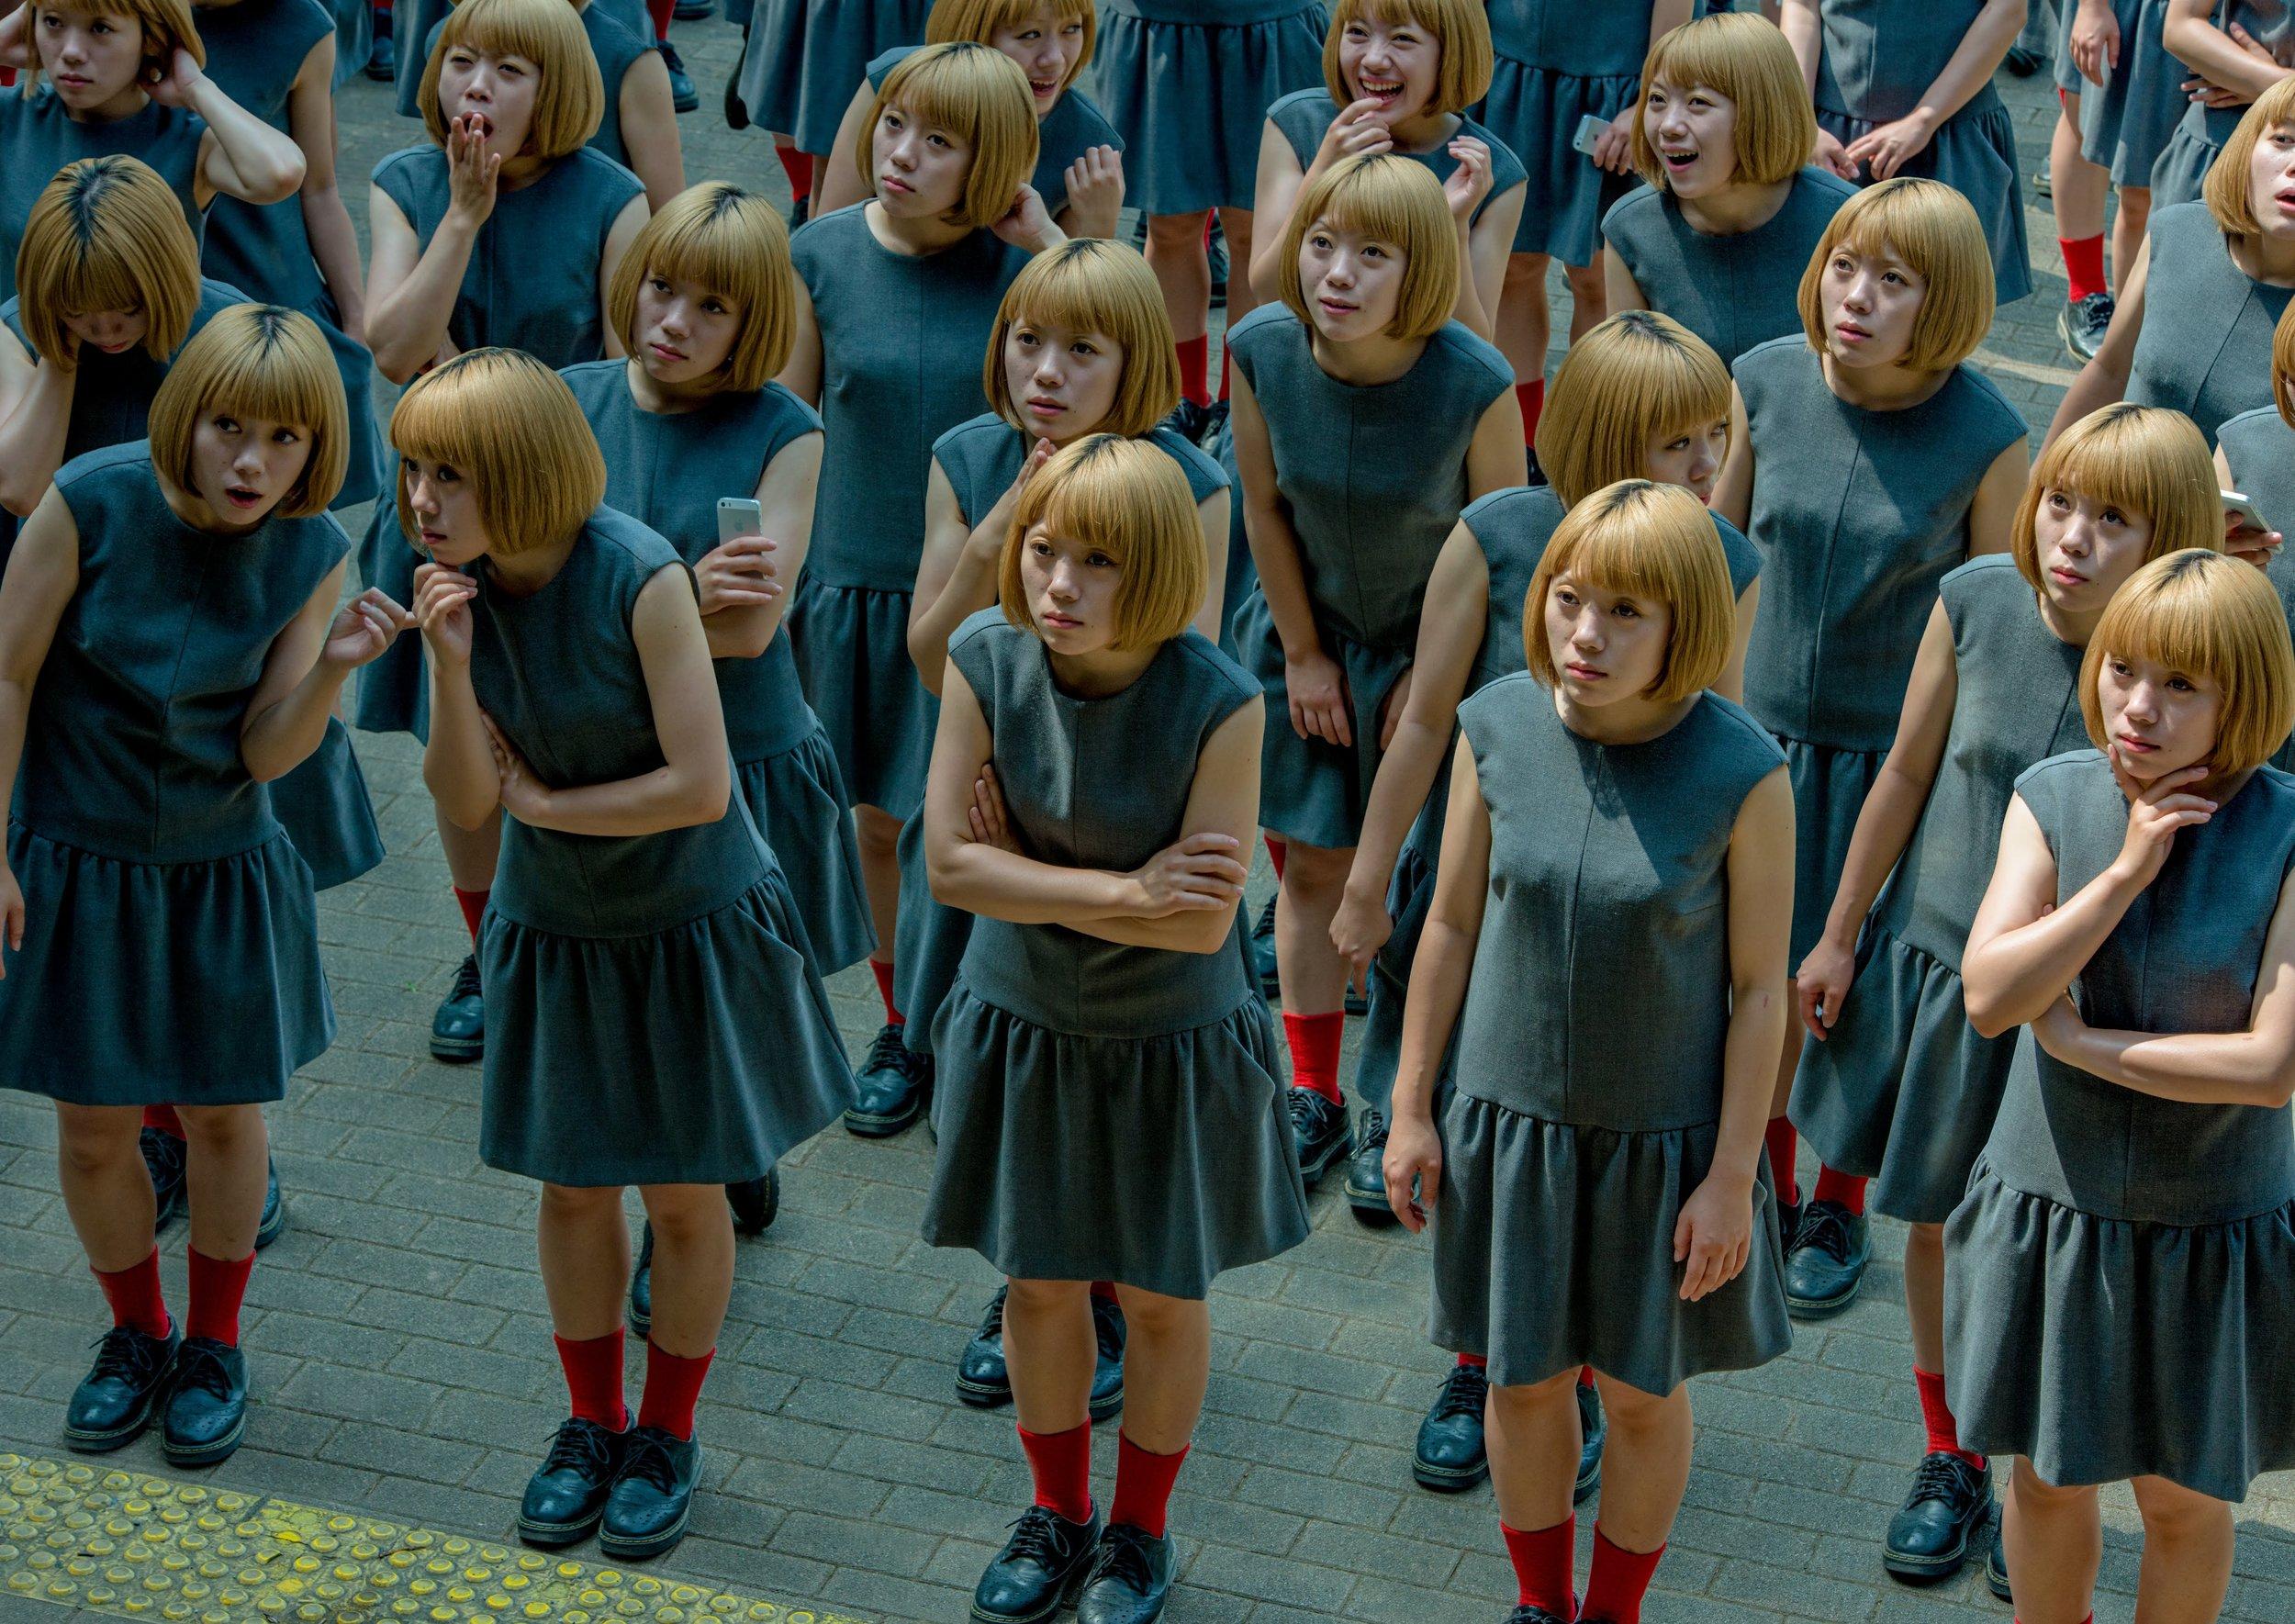 © Daisuke Takakura; Monodramatic / Crowd, 2014, Digital C-type print , 42 x 59.4 cm Ed. 10, 145.6 x 103 cm Ed. 5